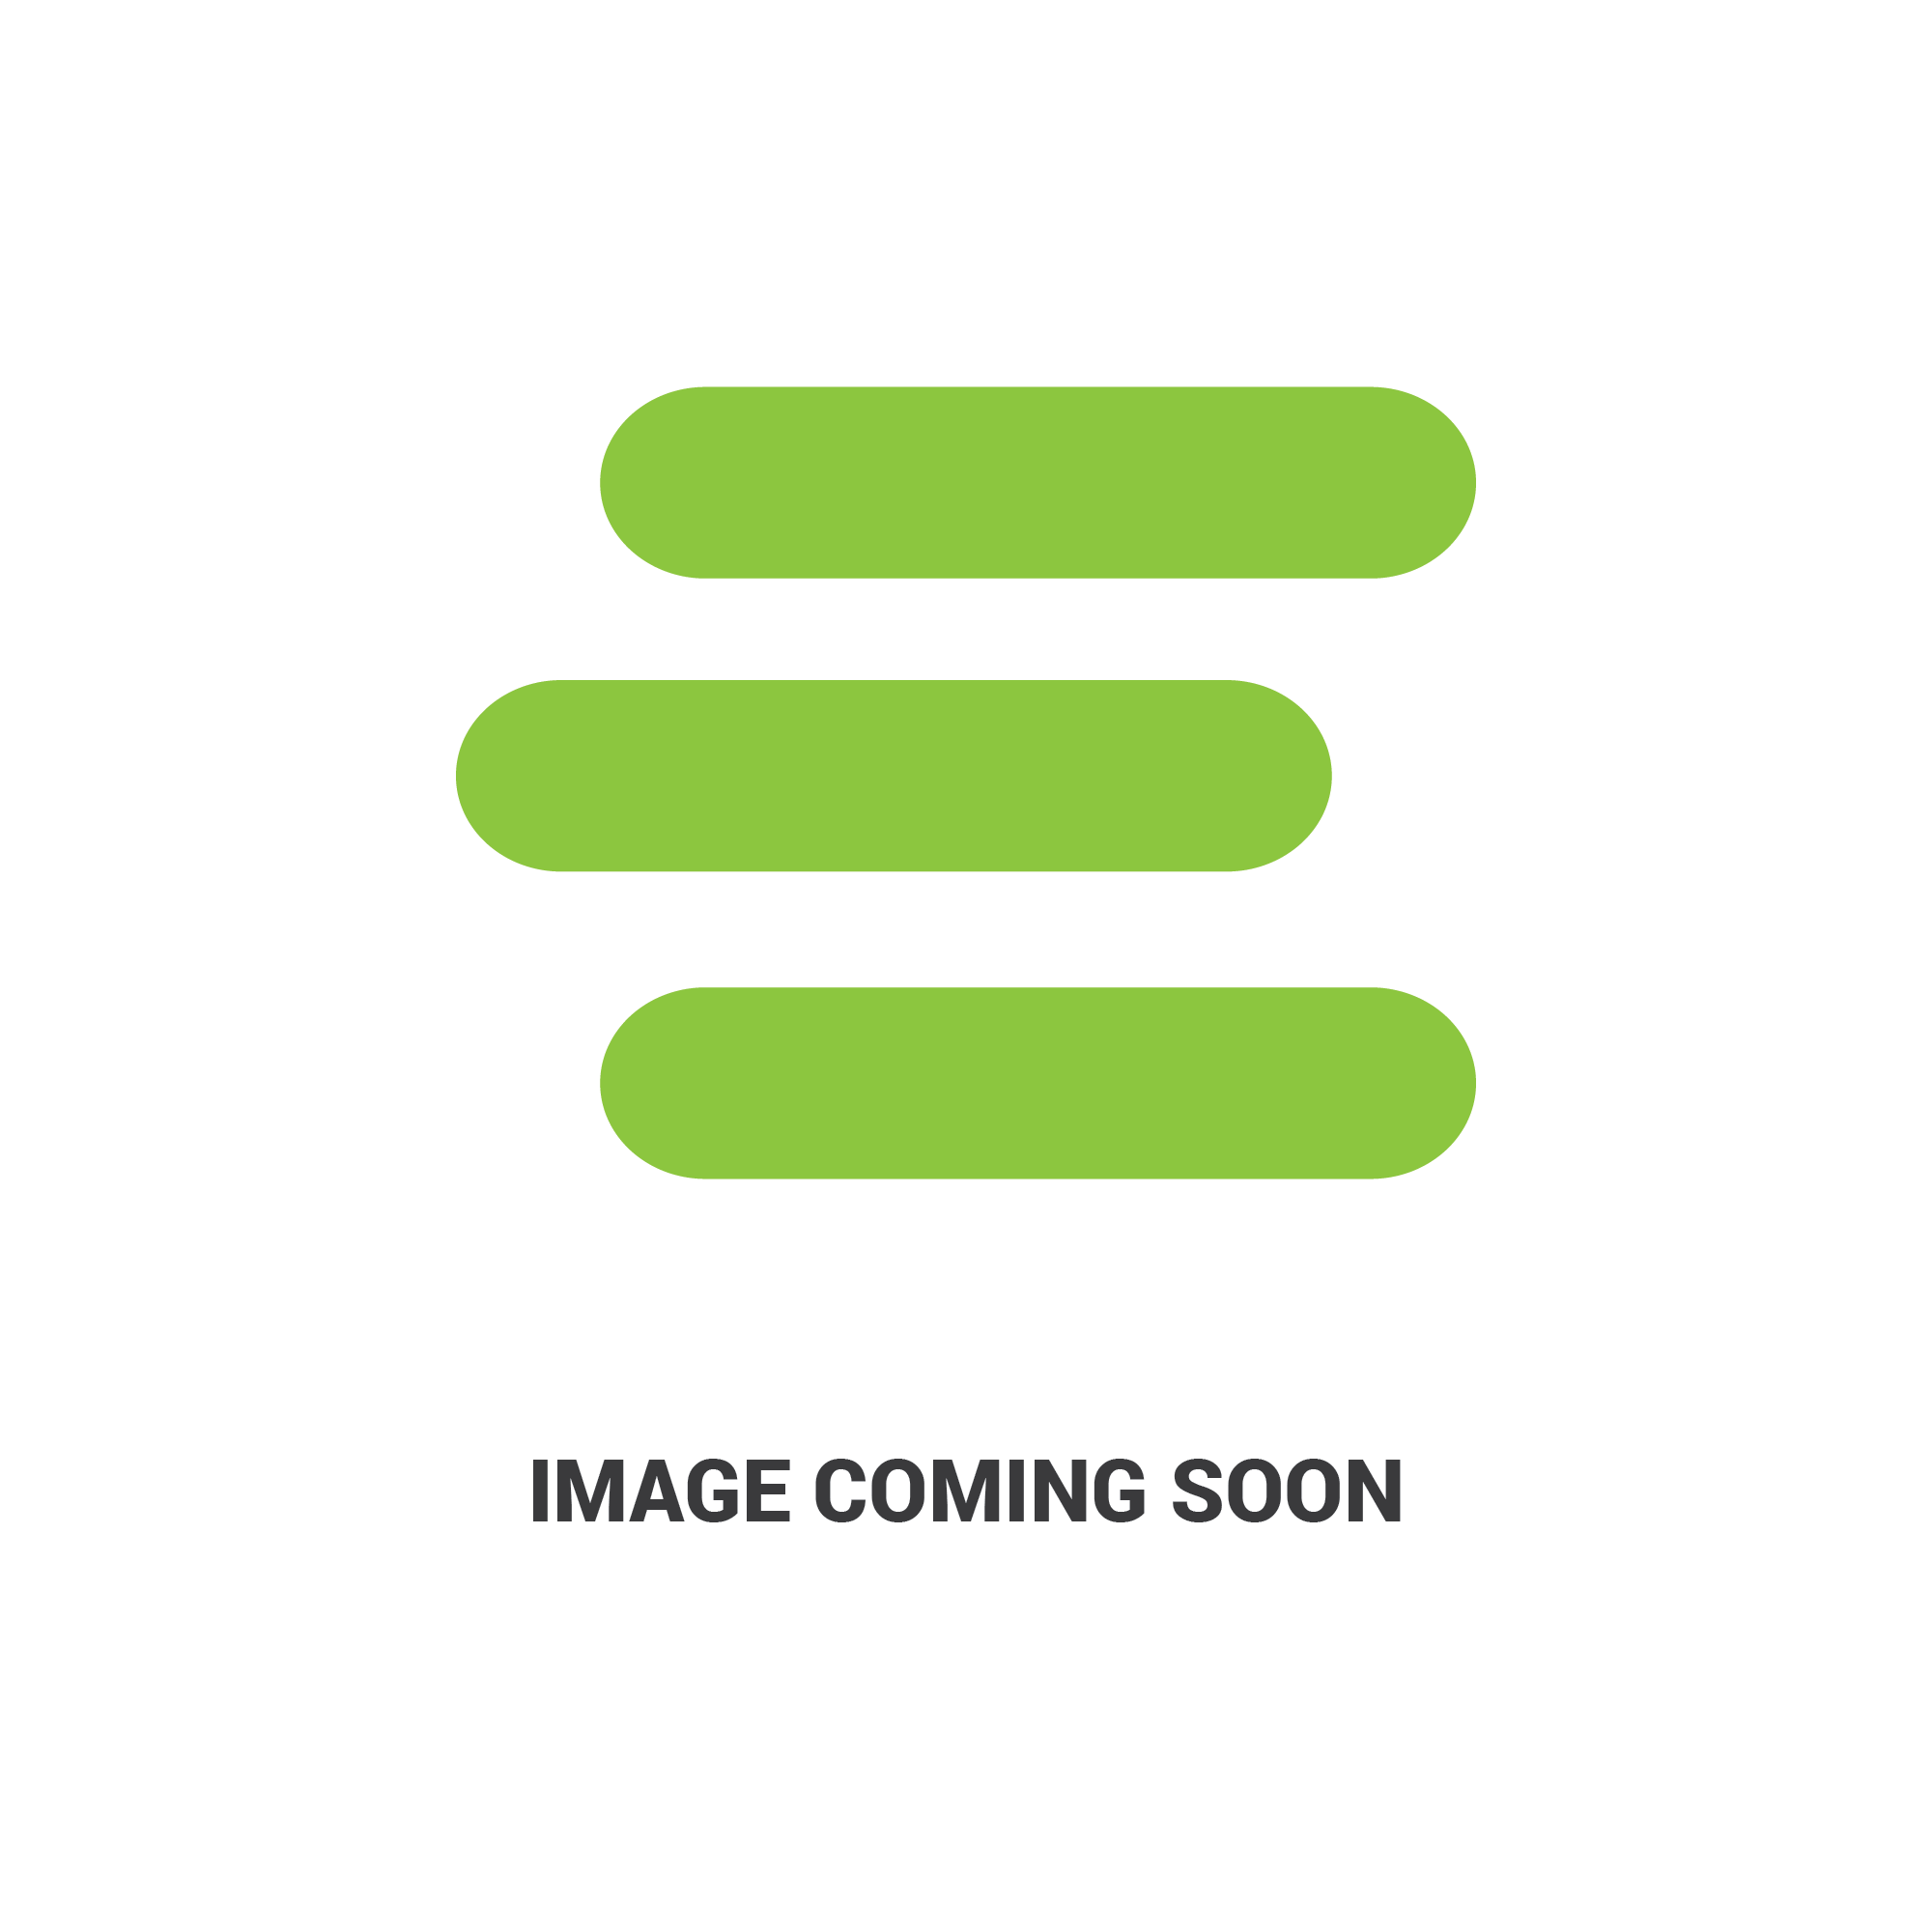 E-839570981531_1.jpg